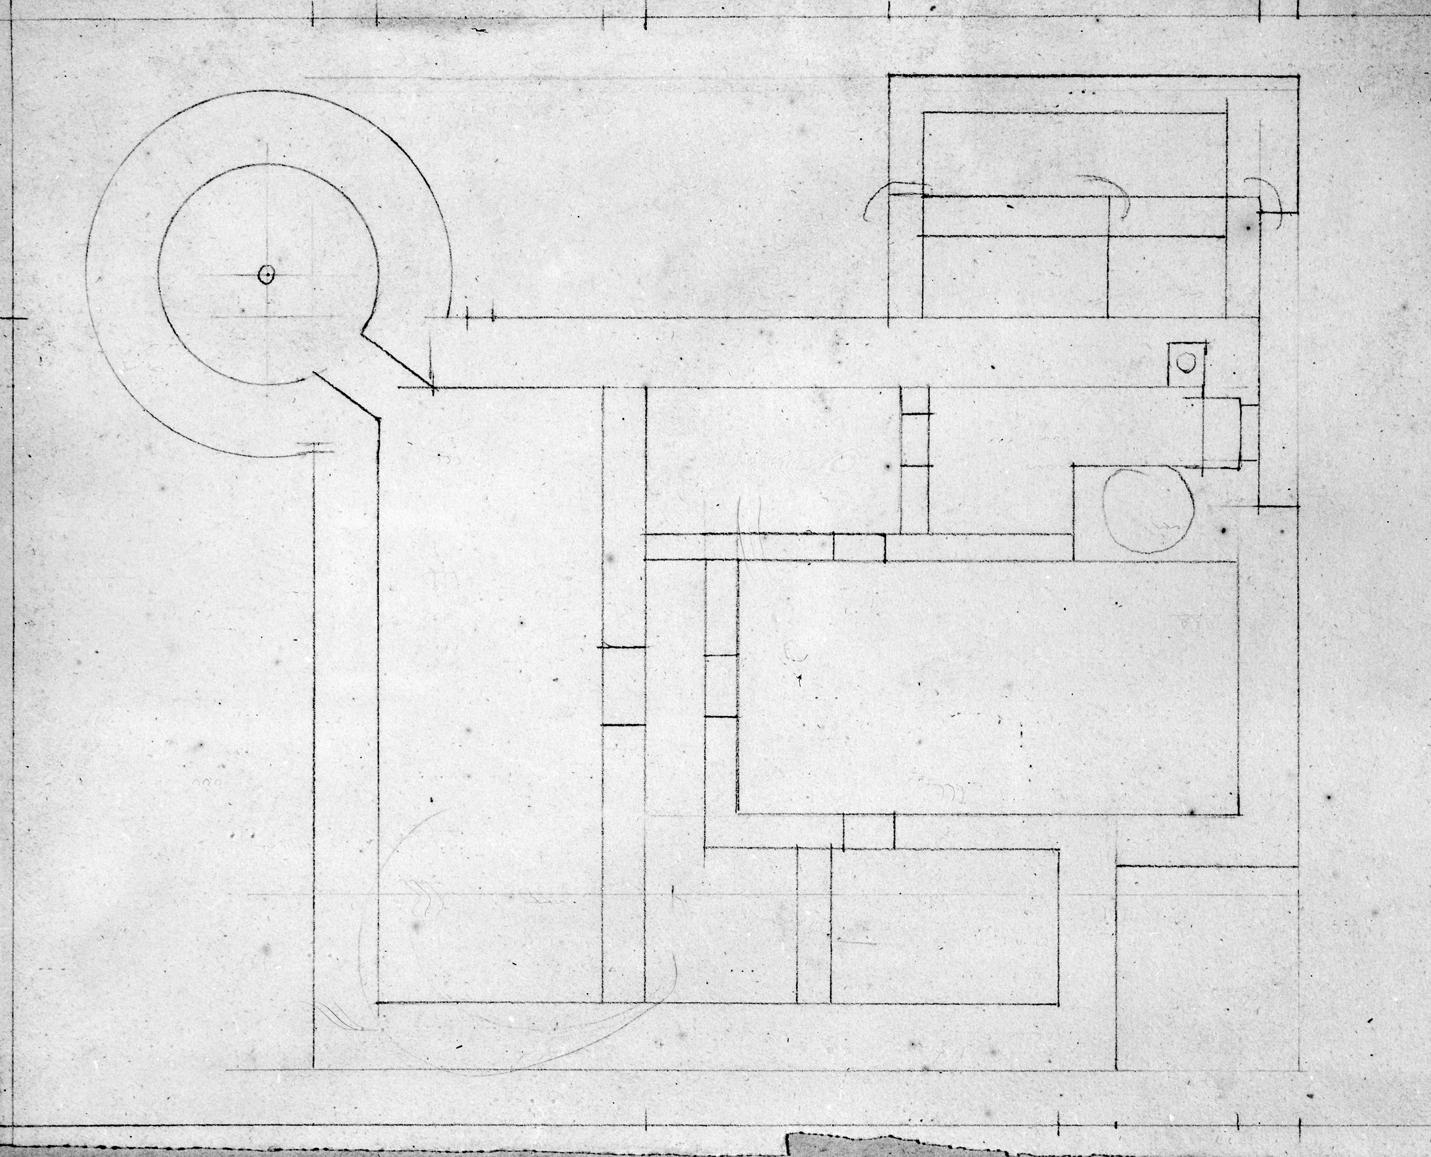 Herrenhaus, Grundrißskizze. Blei 18,5 x 32 Kein Maßstab, unbezeichnet. 19. Jh. (LWL-Münster 80/3003)